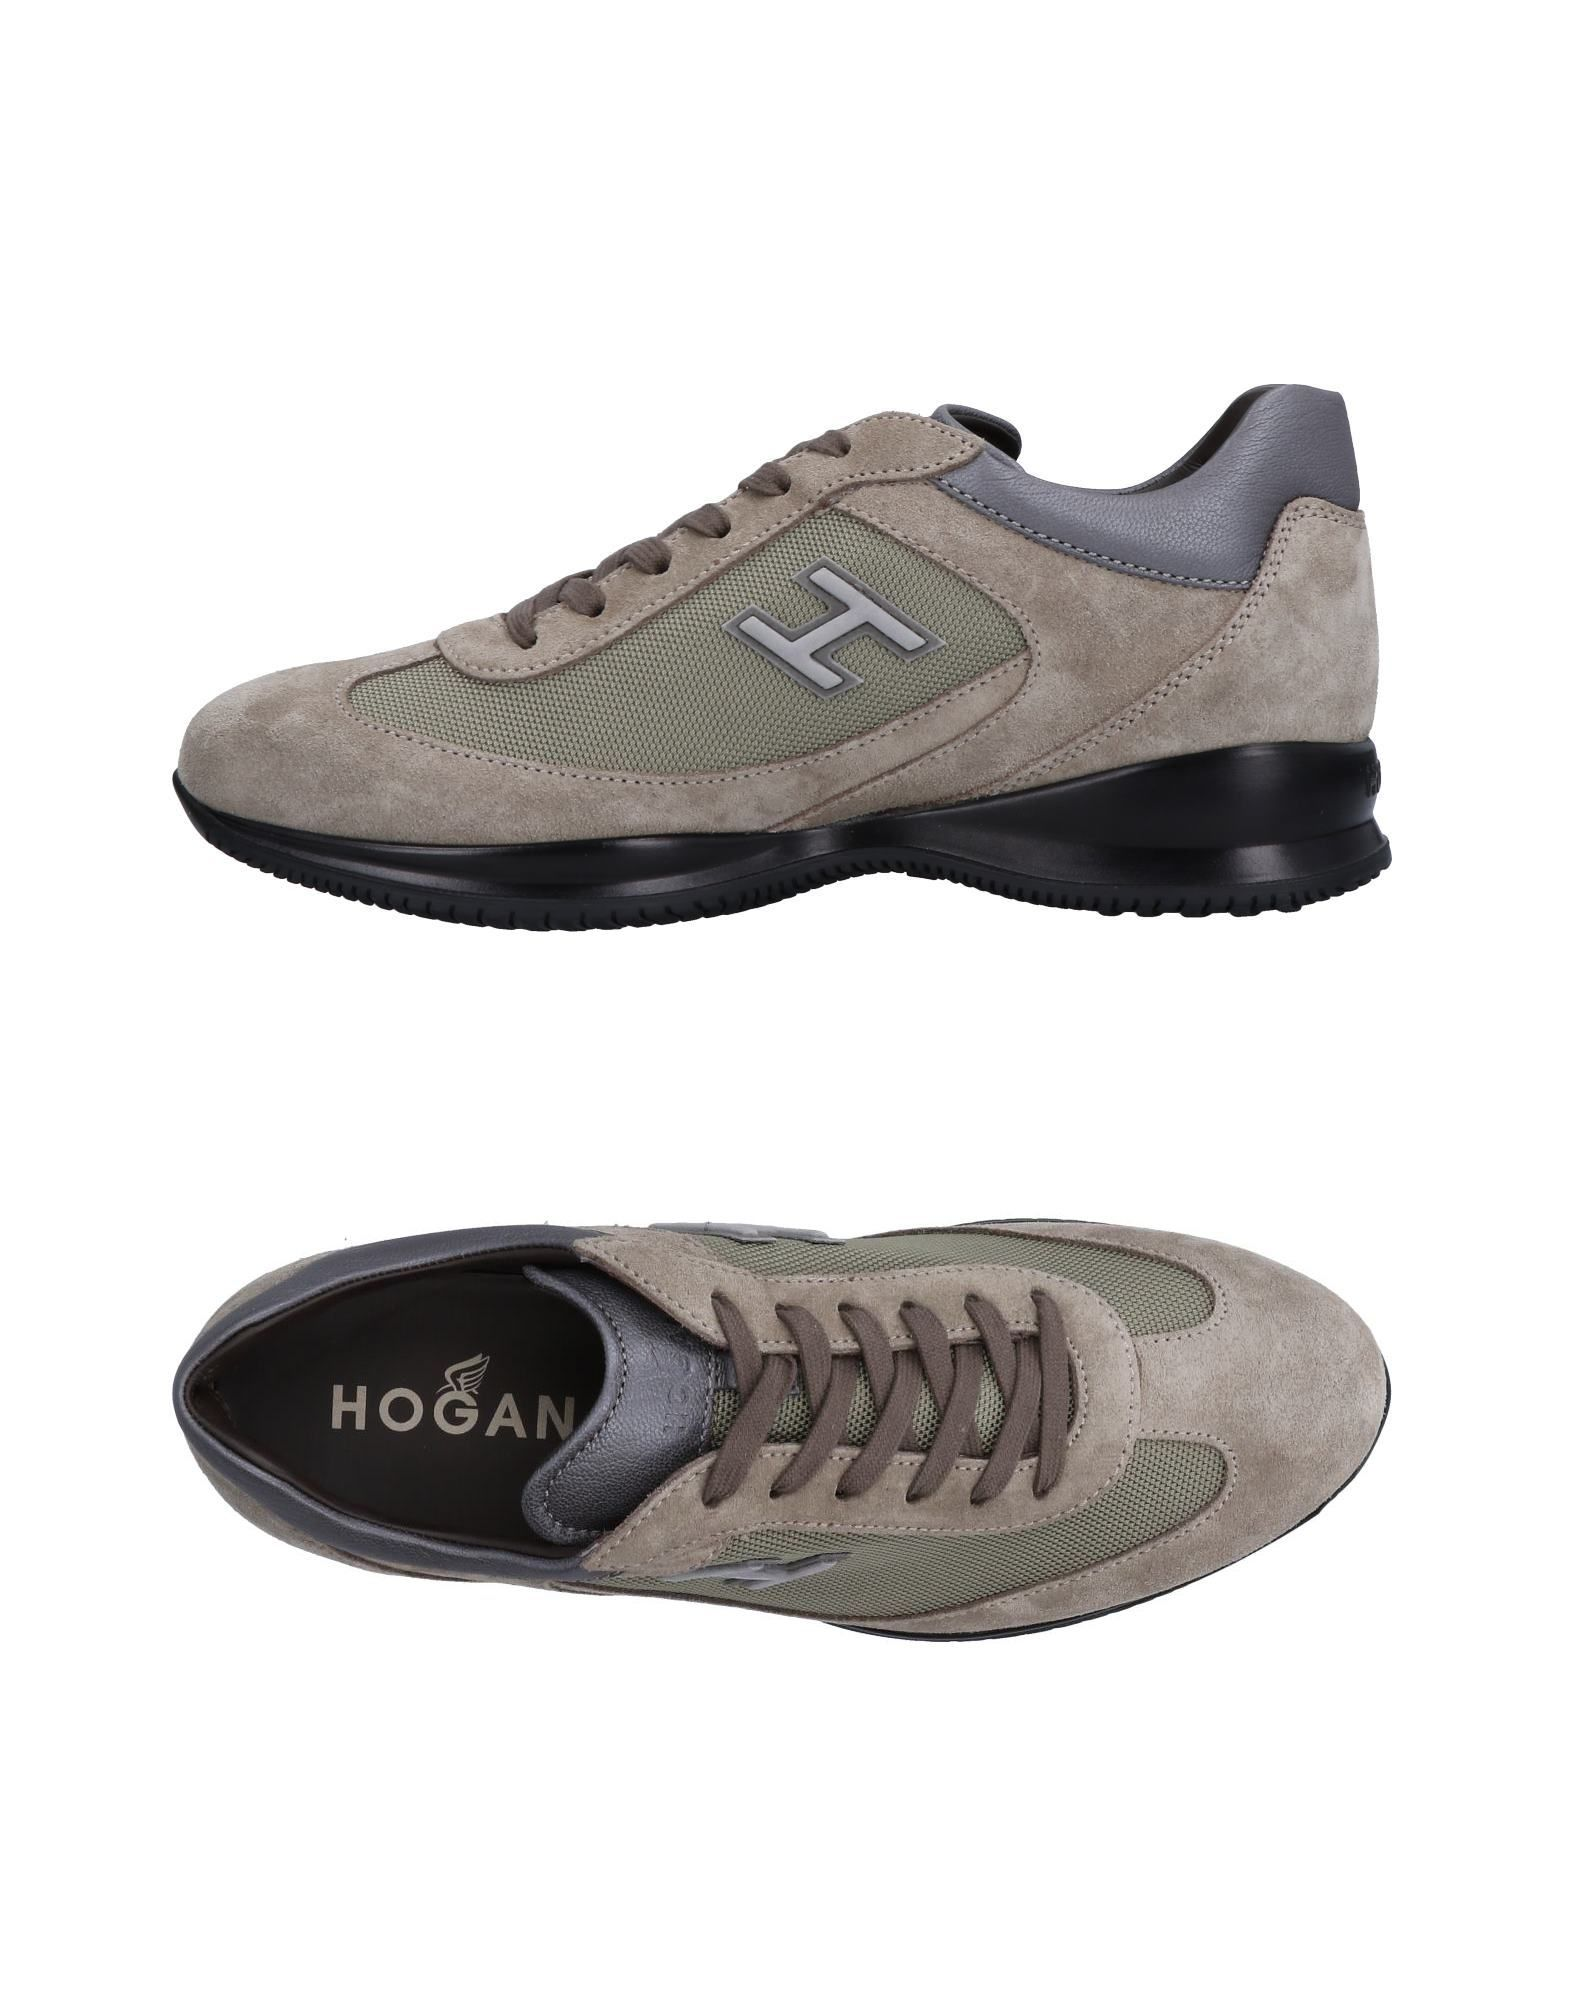 Hogan Sneakers Herren  11516149PC Gute Qualität beliebte Schuhe